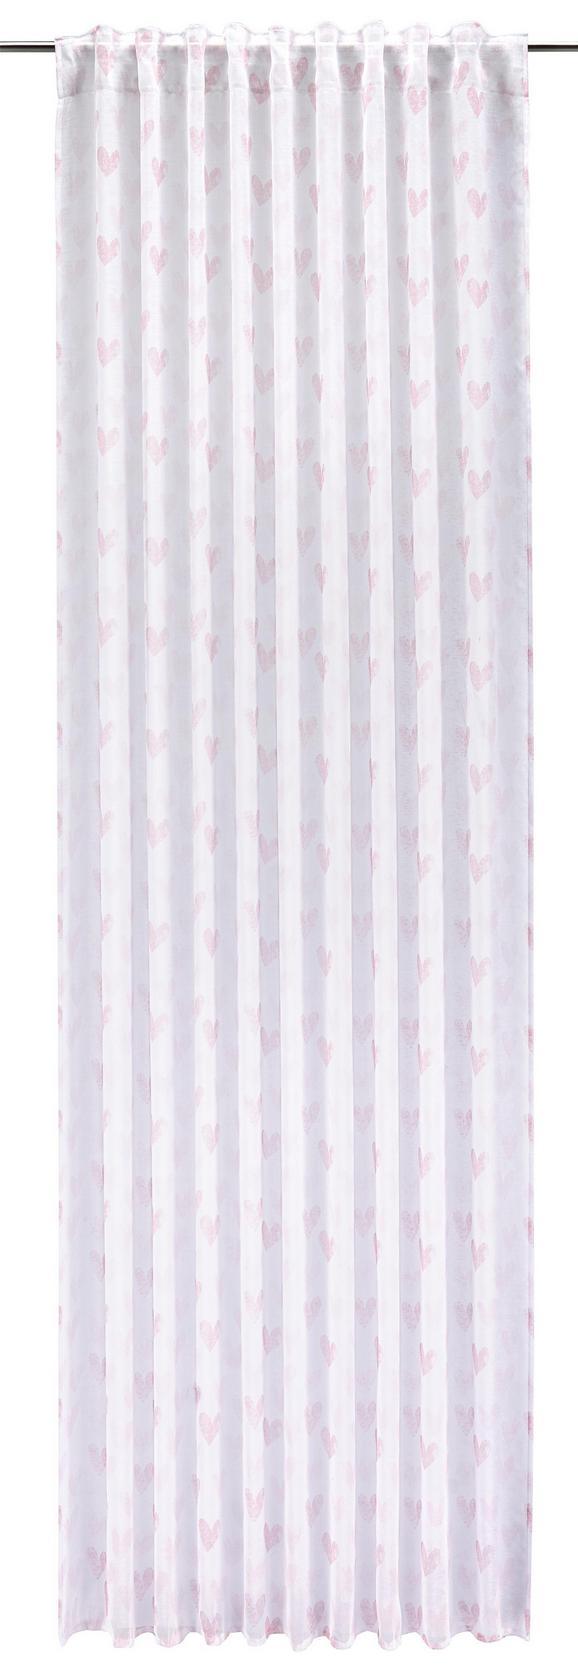 Končana Zavesa Lovely -ext- - roza, Romantika, tekstil (140/245cm) - Mömax modern living